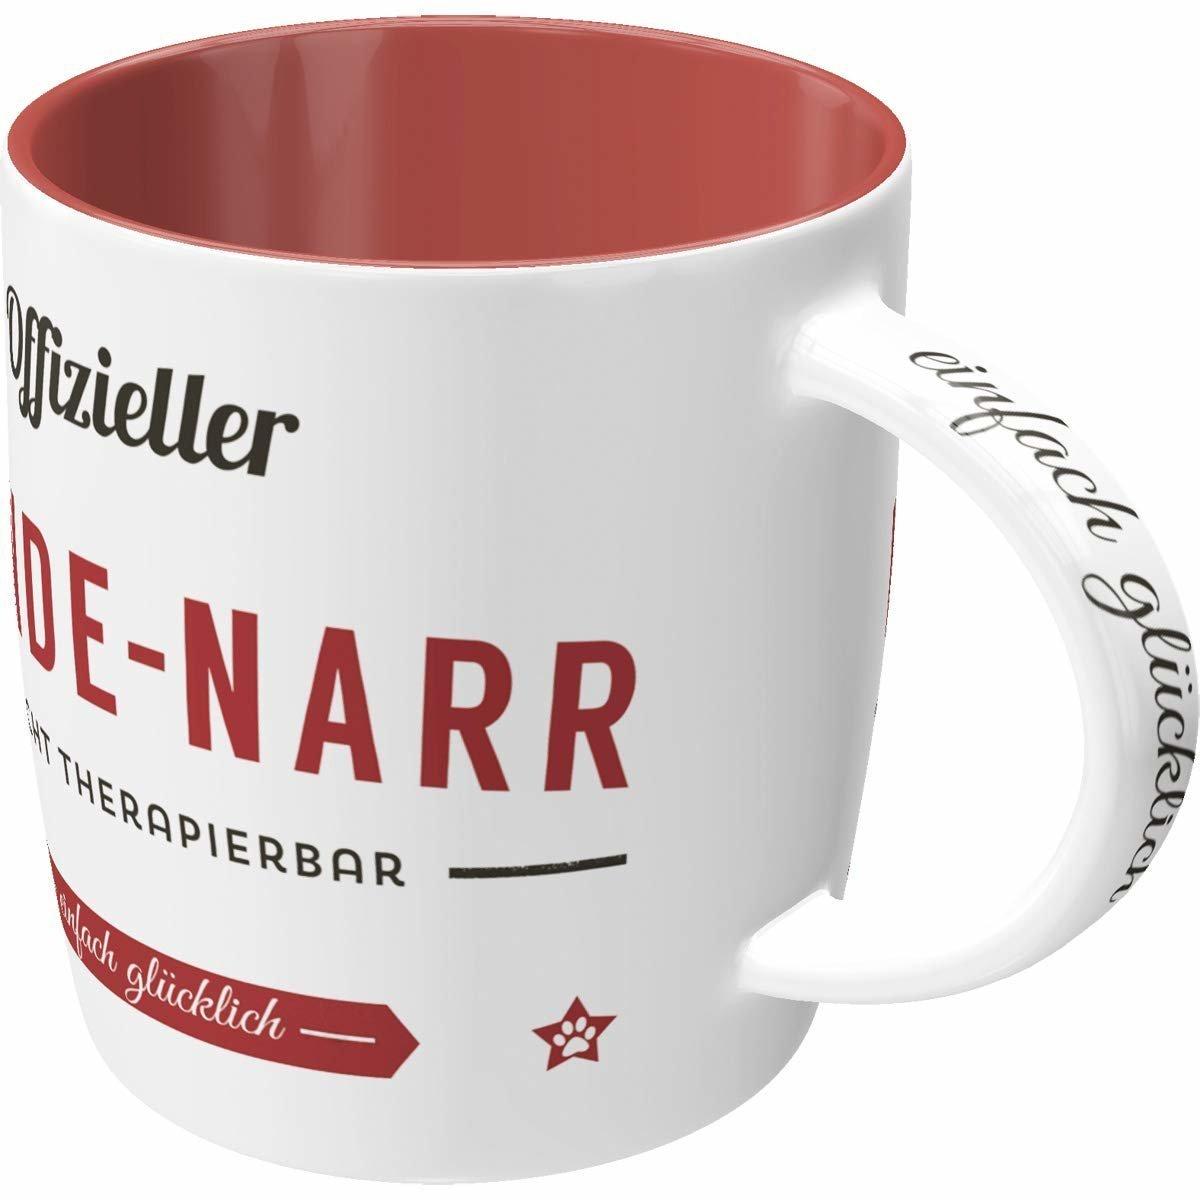 Nostalgic-Art Kaffee-Becher Hunde-Narr, Bild 4